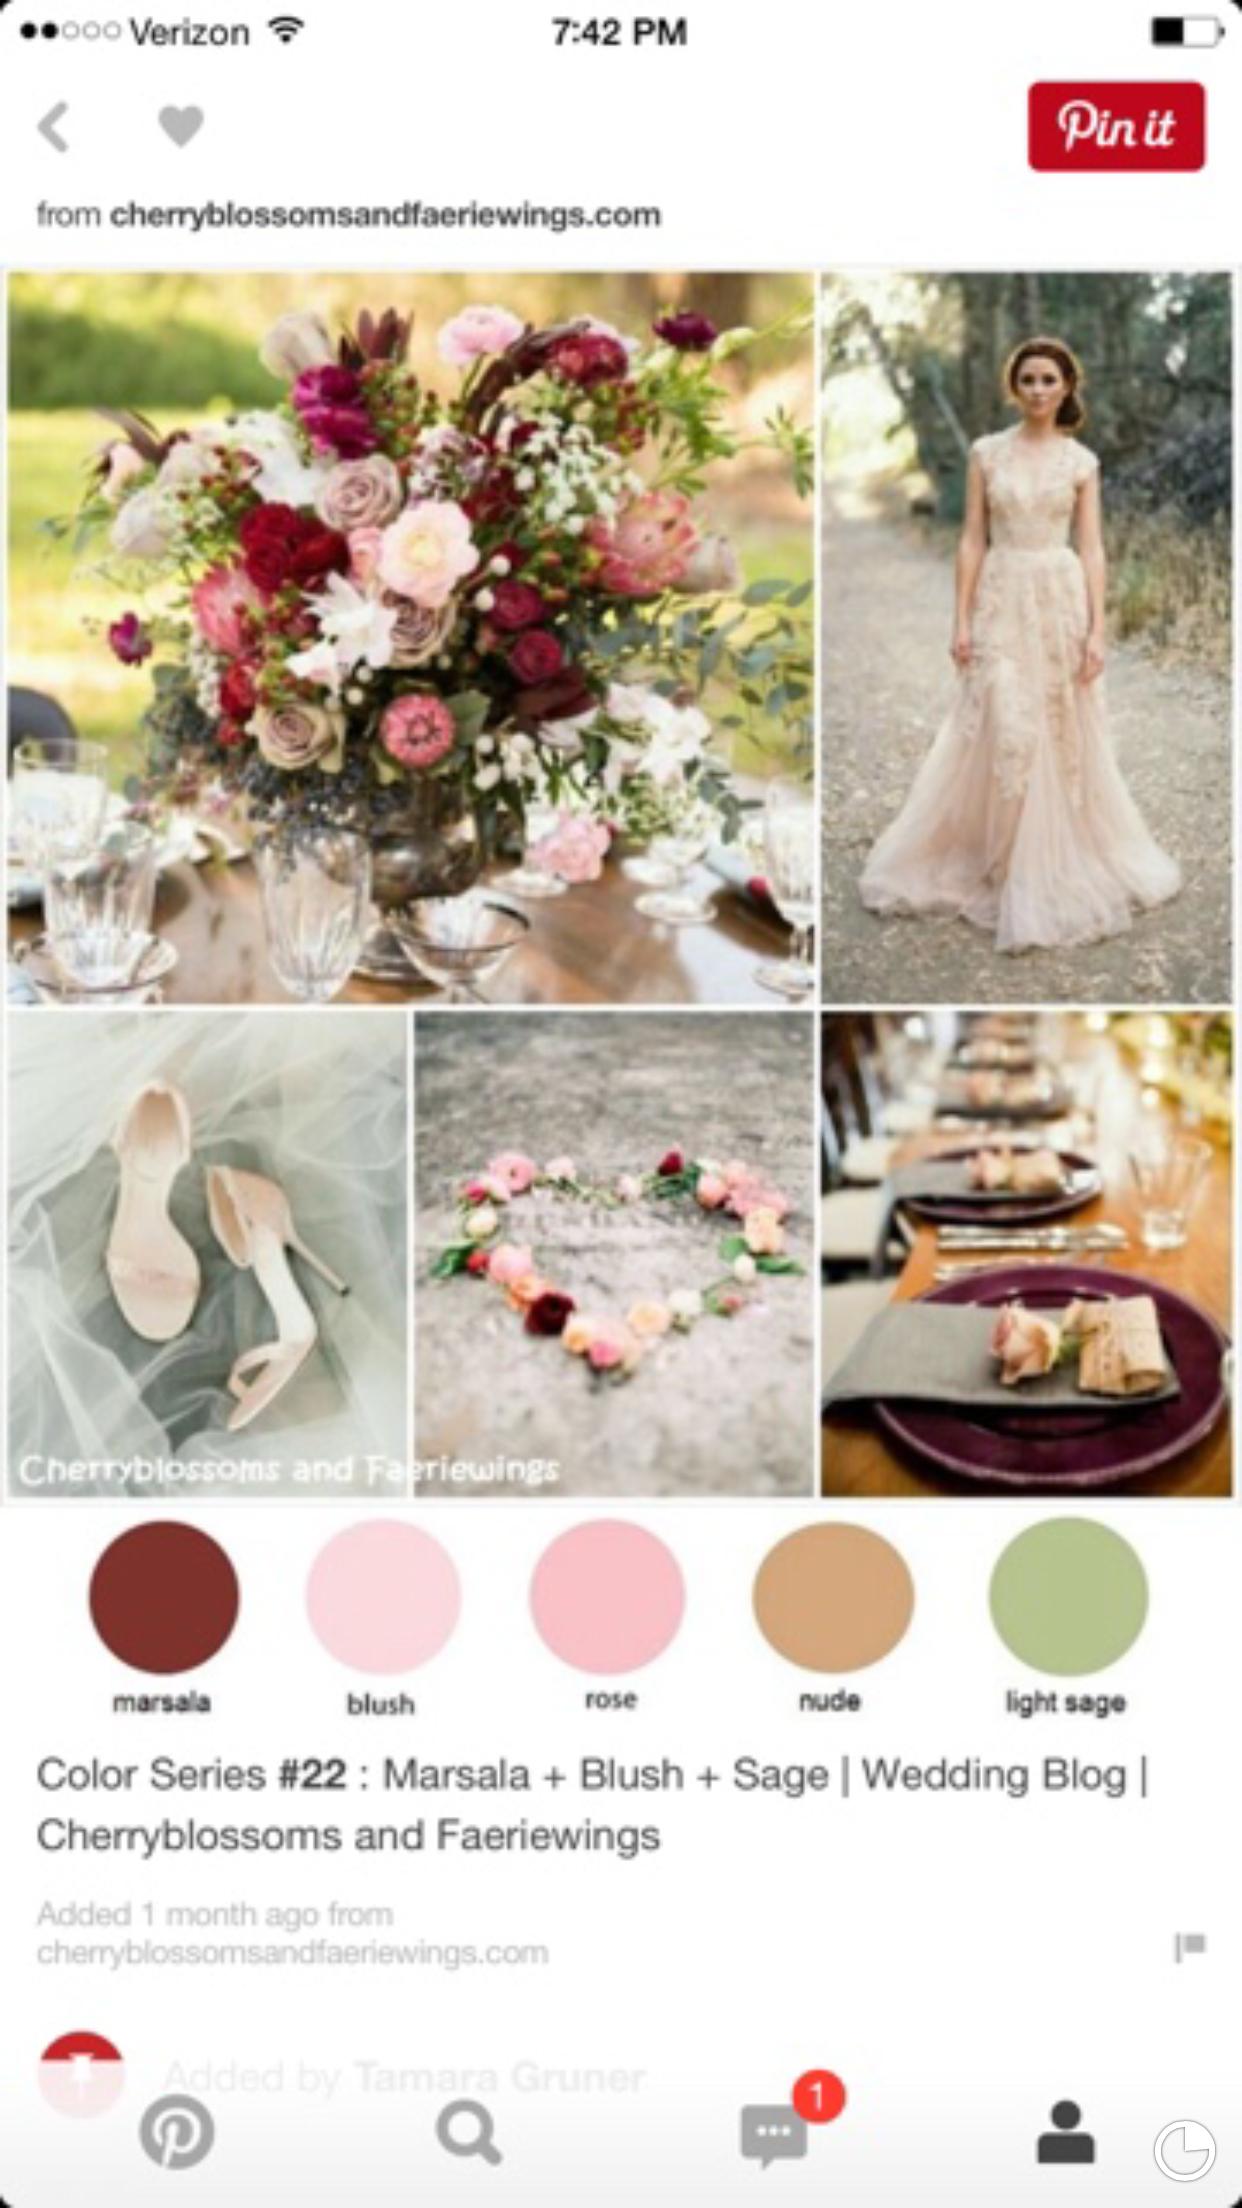 Pink and maroon wedding decor  Plus golds  Wedding ideas  Pinterest  Wedding Weddings and